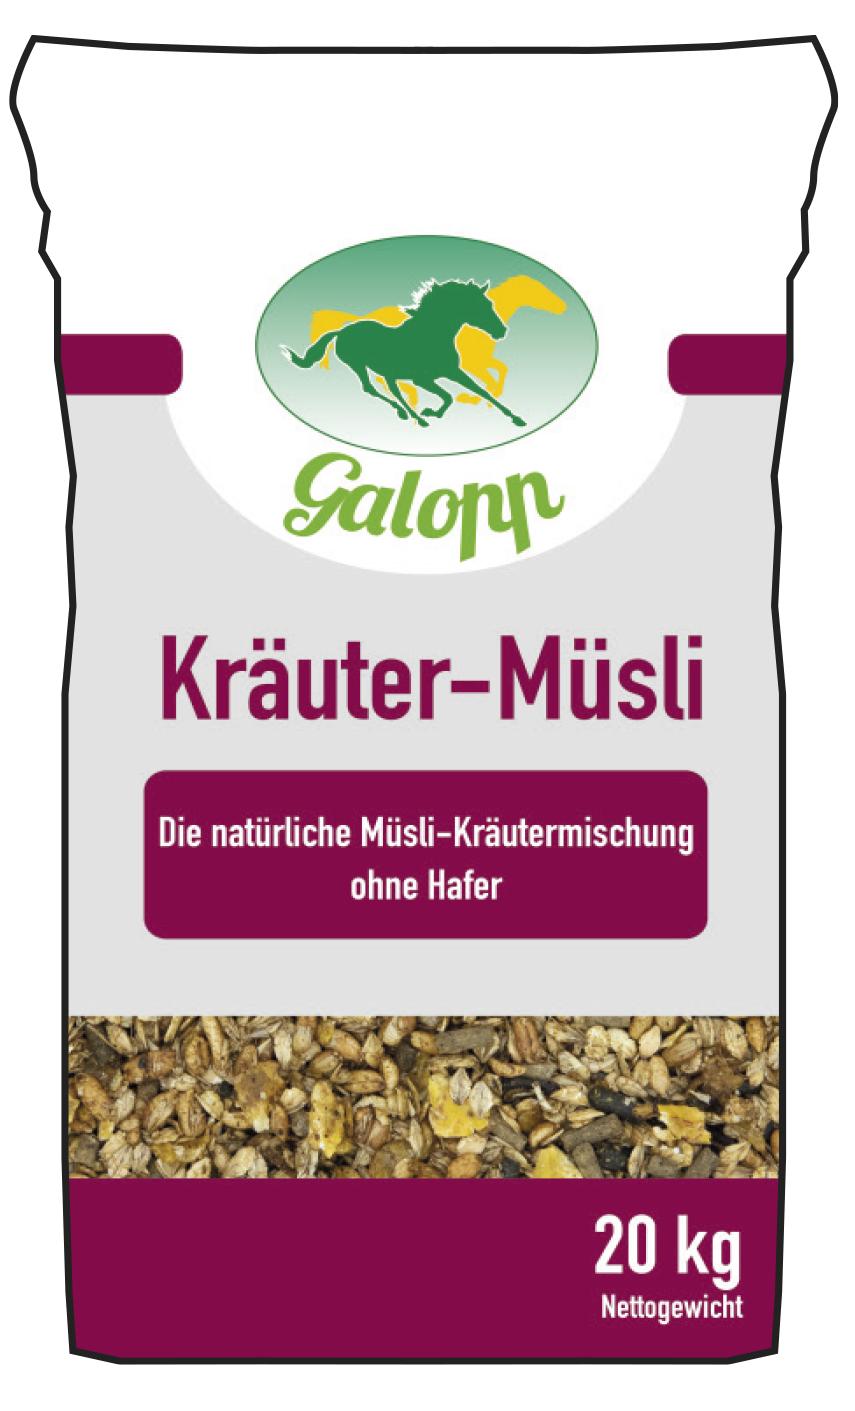 Kräuter-Müsli